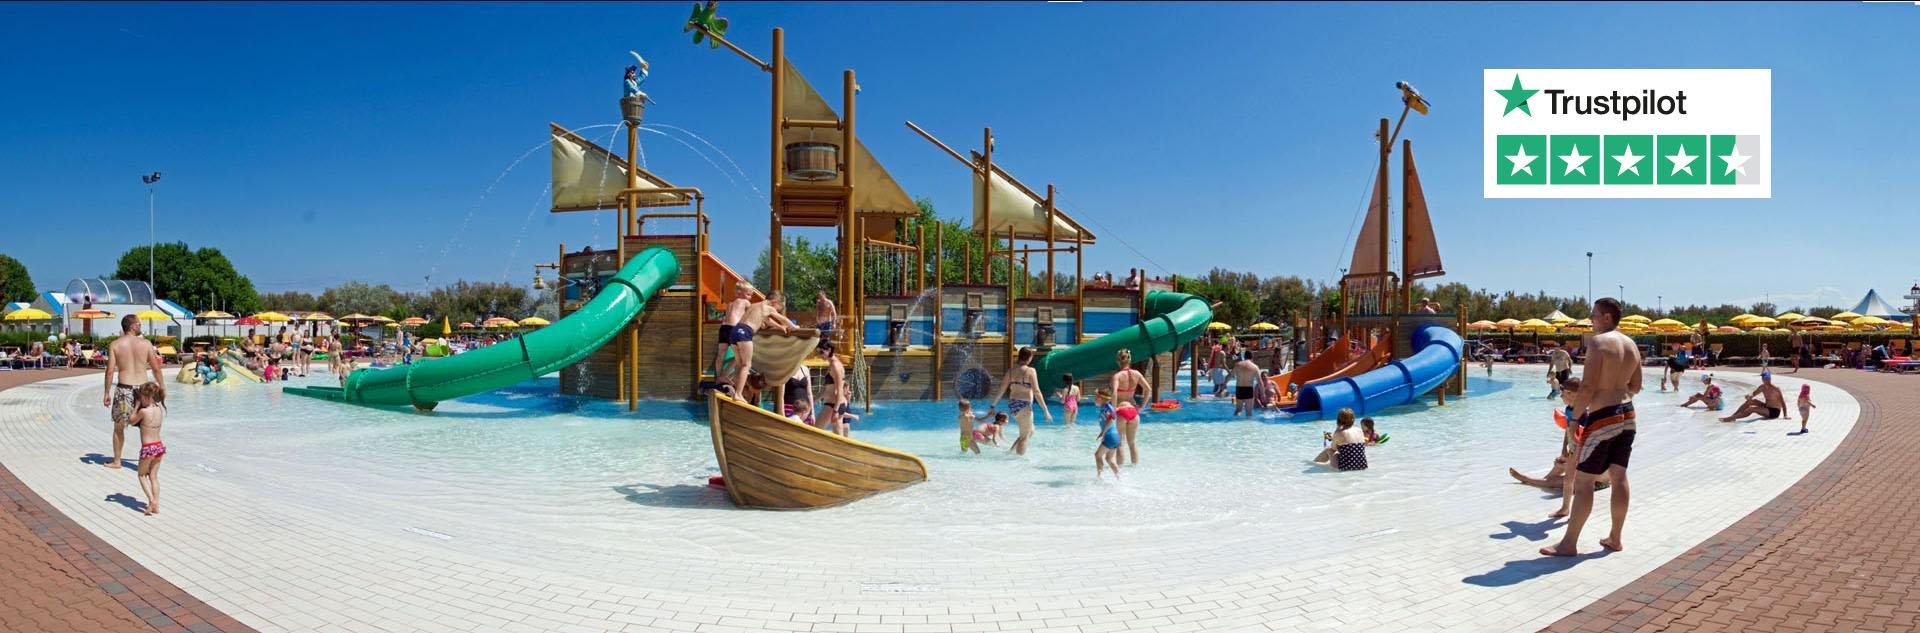 Pra delle Torri - Banner foto zwembad piratenbad